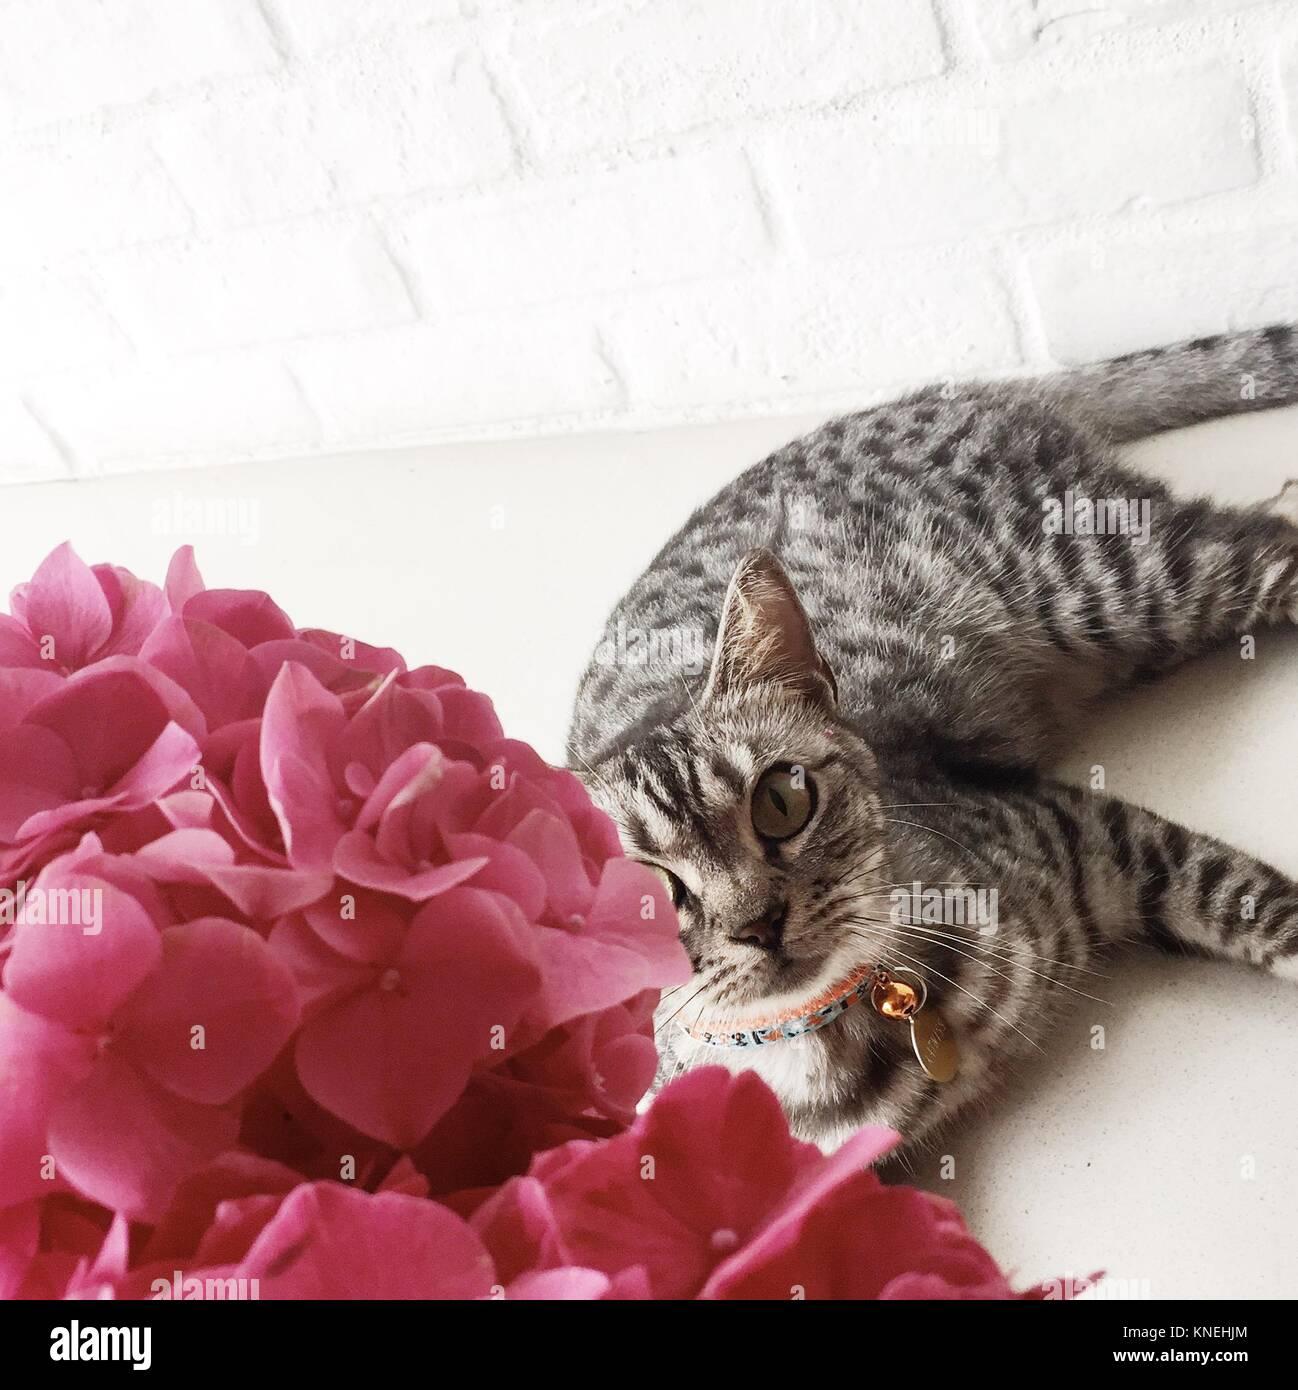 American shorthair Cat lying next to Hydrangea flowers Stock Photo